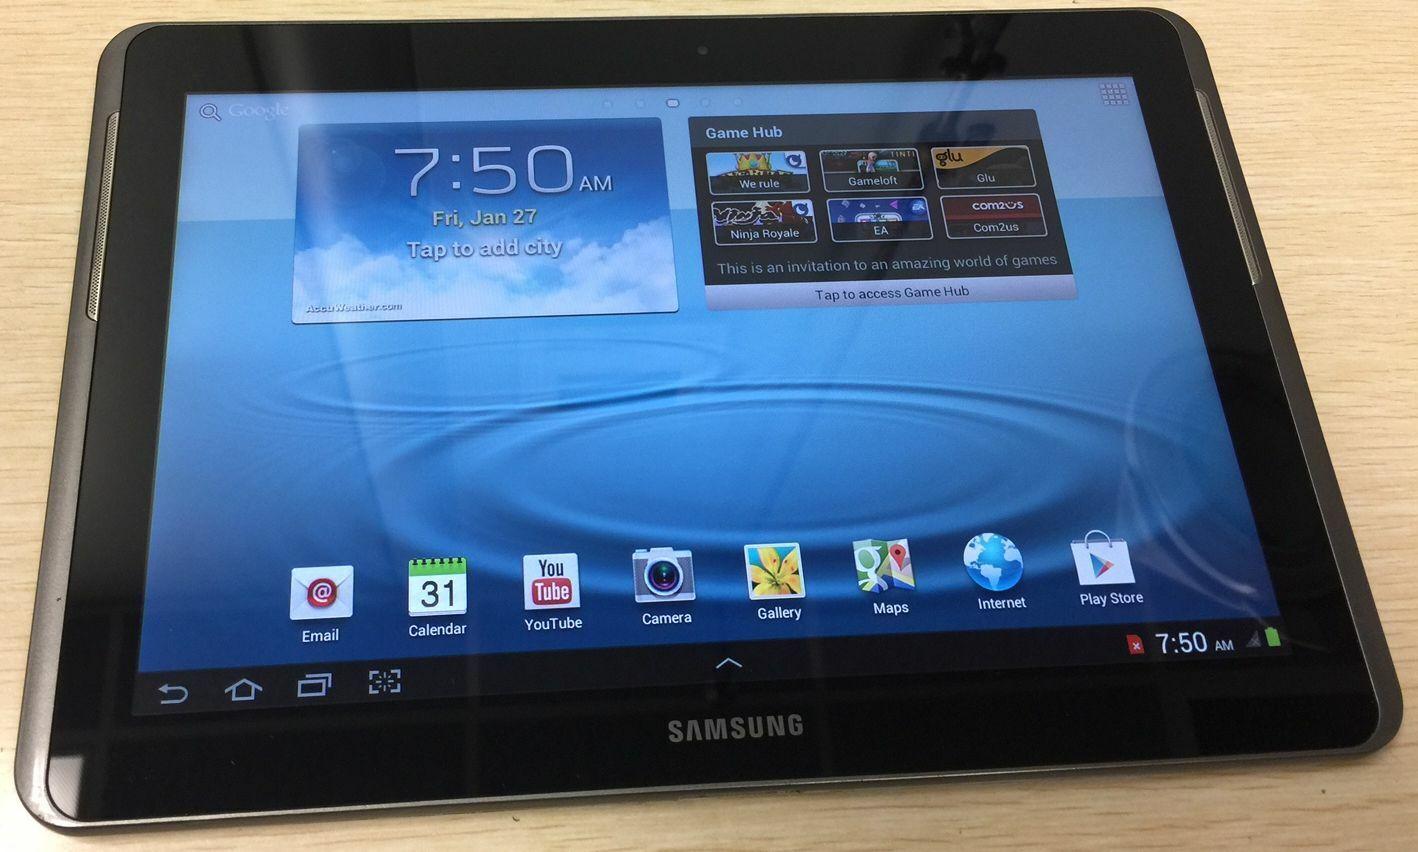 Samsung Galaxy Tab 2 SCH-I915 8GB,Verizon, Wi-Fi 10.1in - Gray